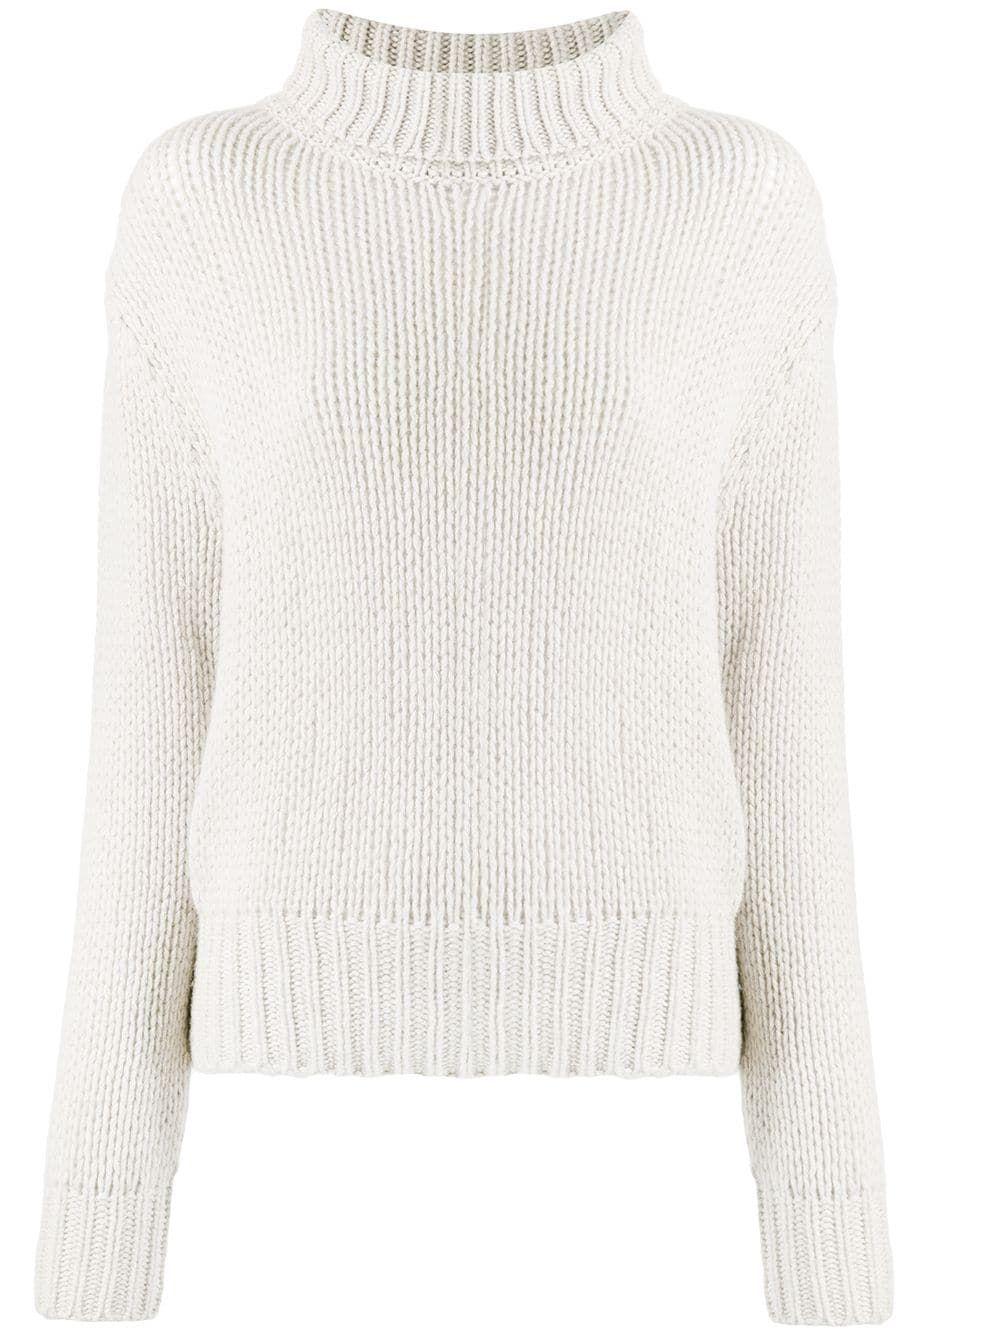 Aragona chunky knit jumper – White